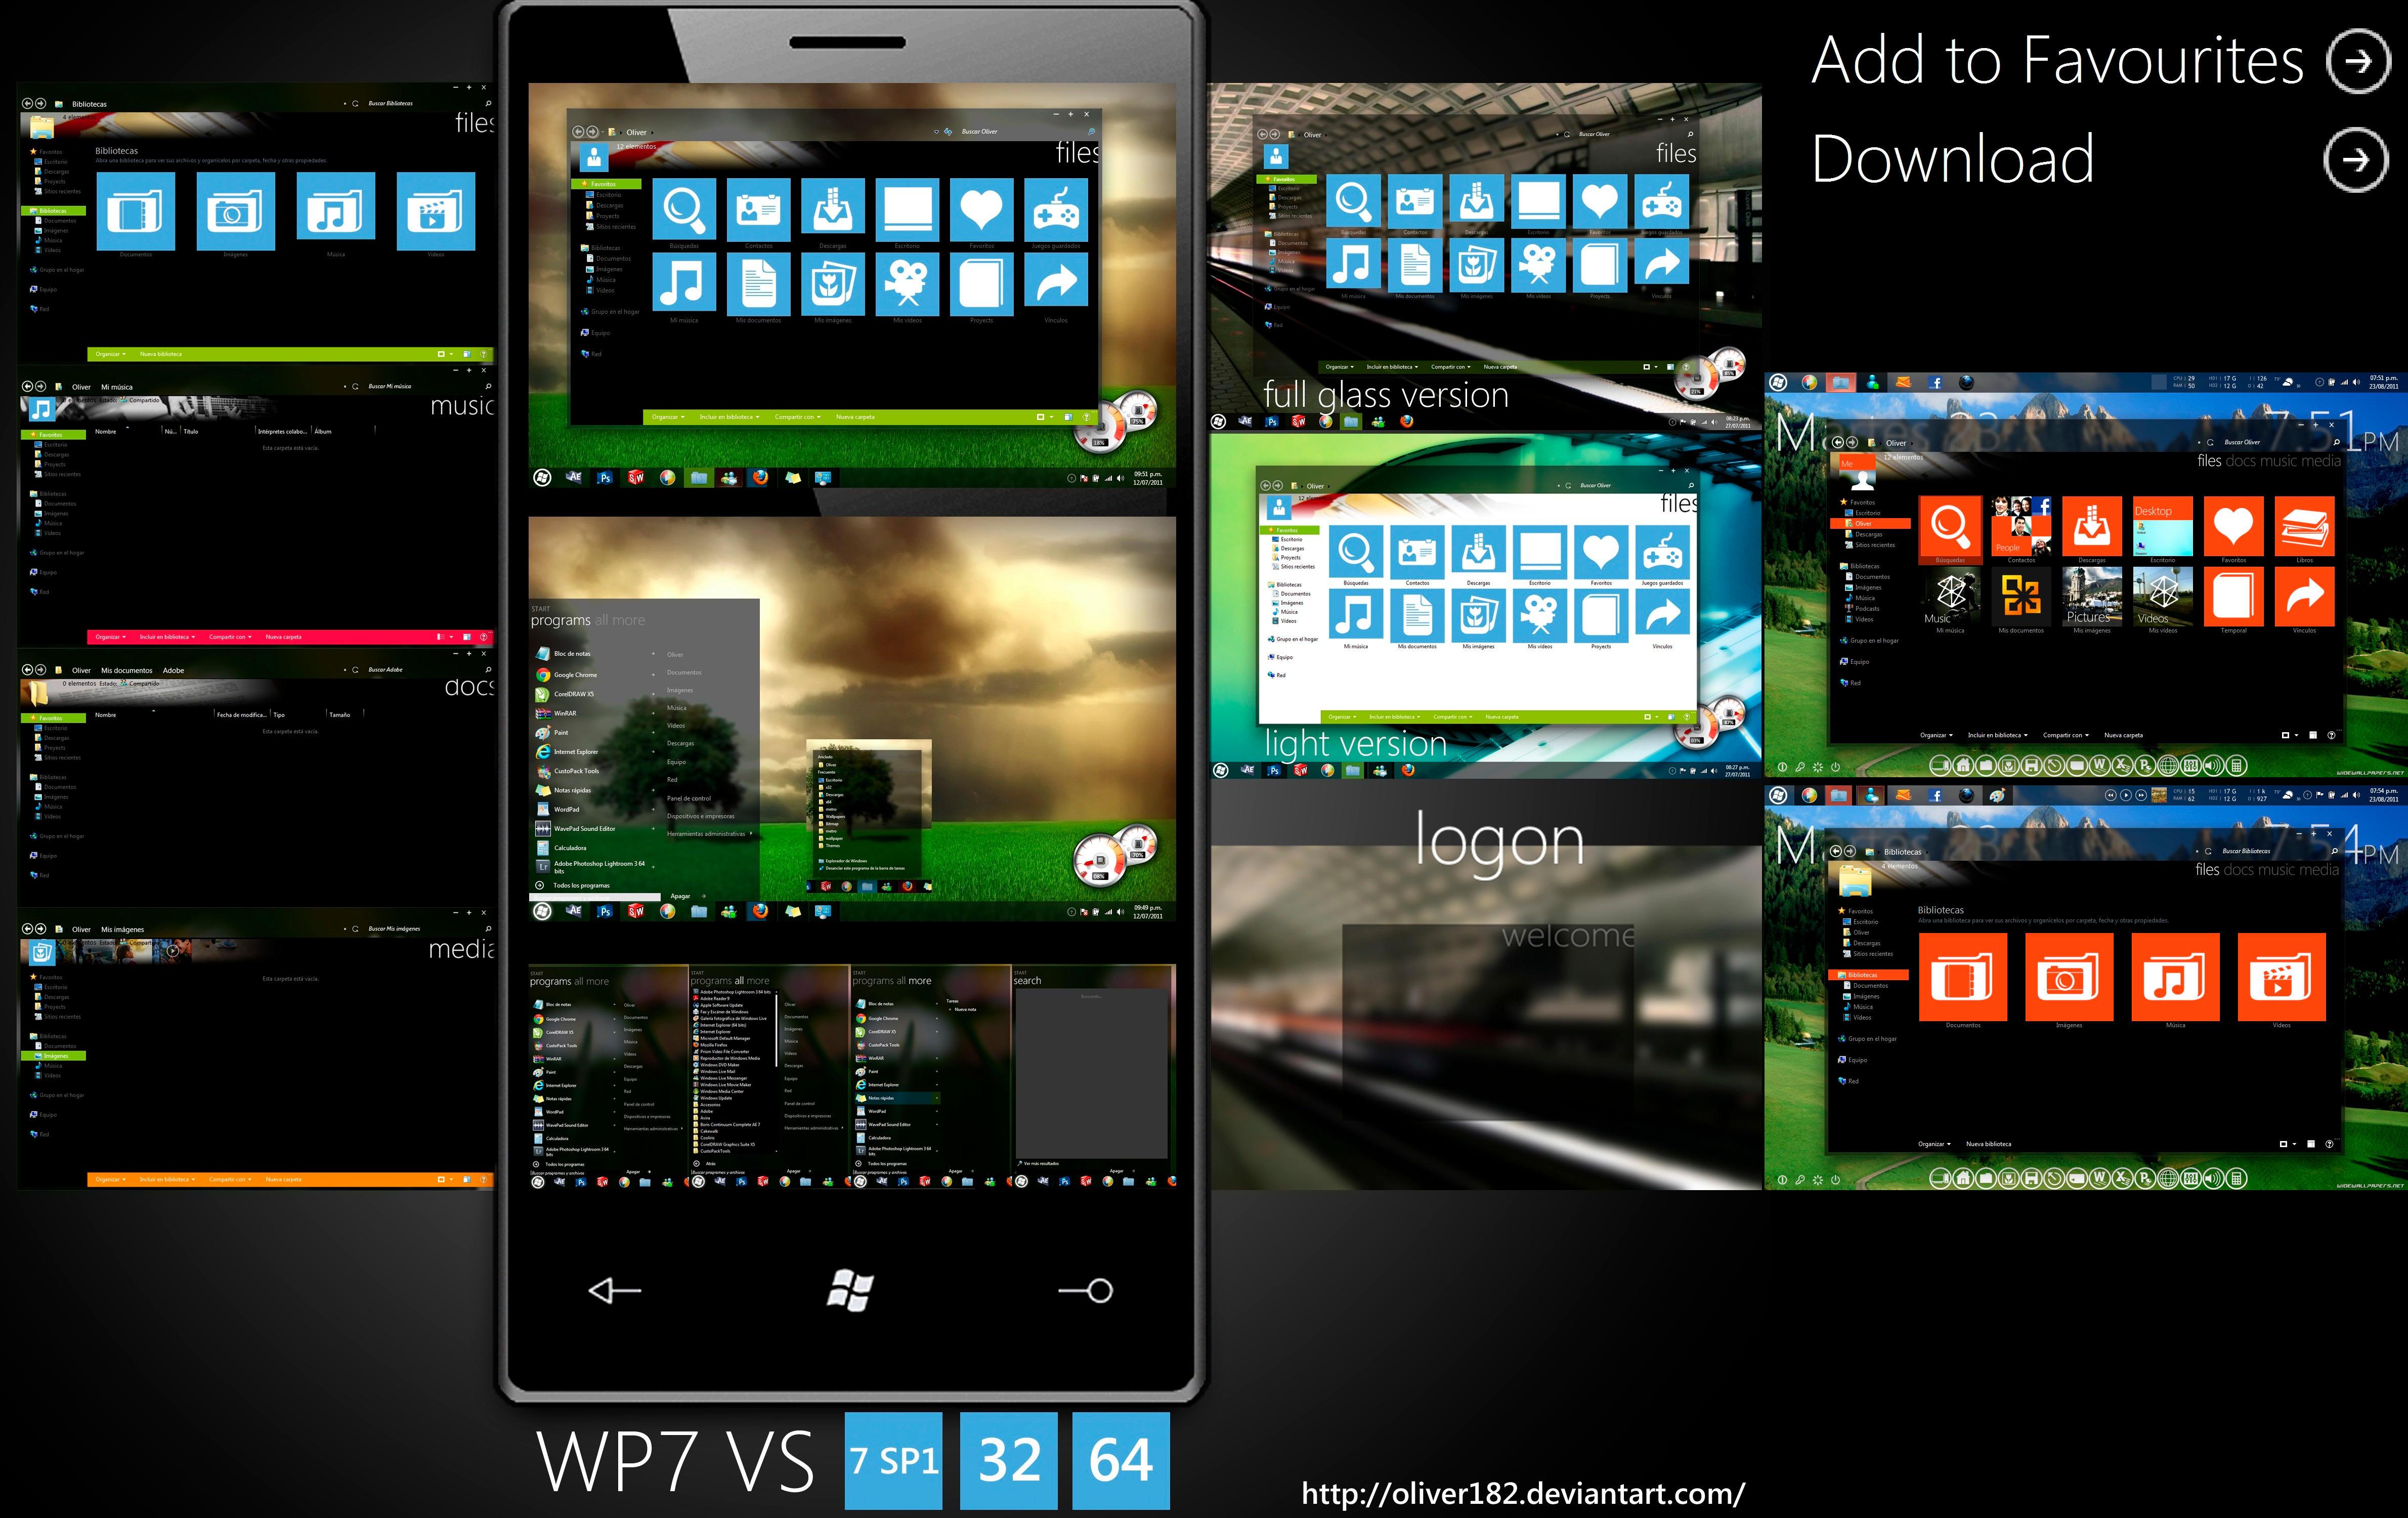 WP7 Mango VS by oliver182